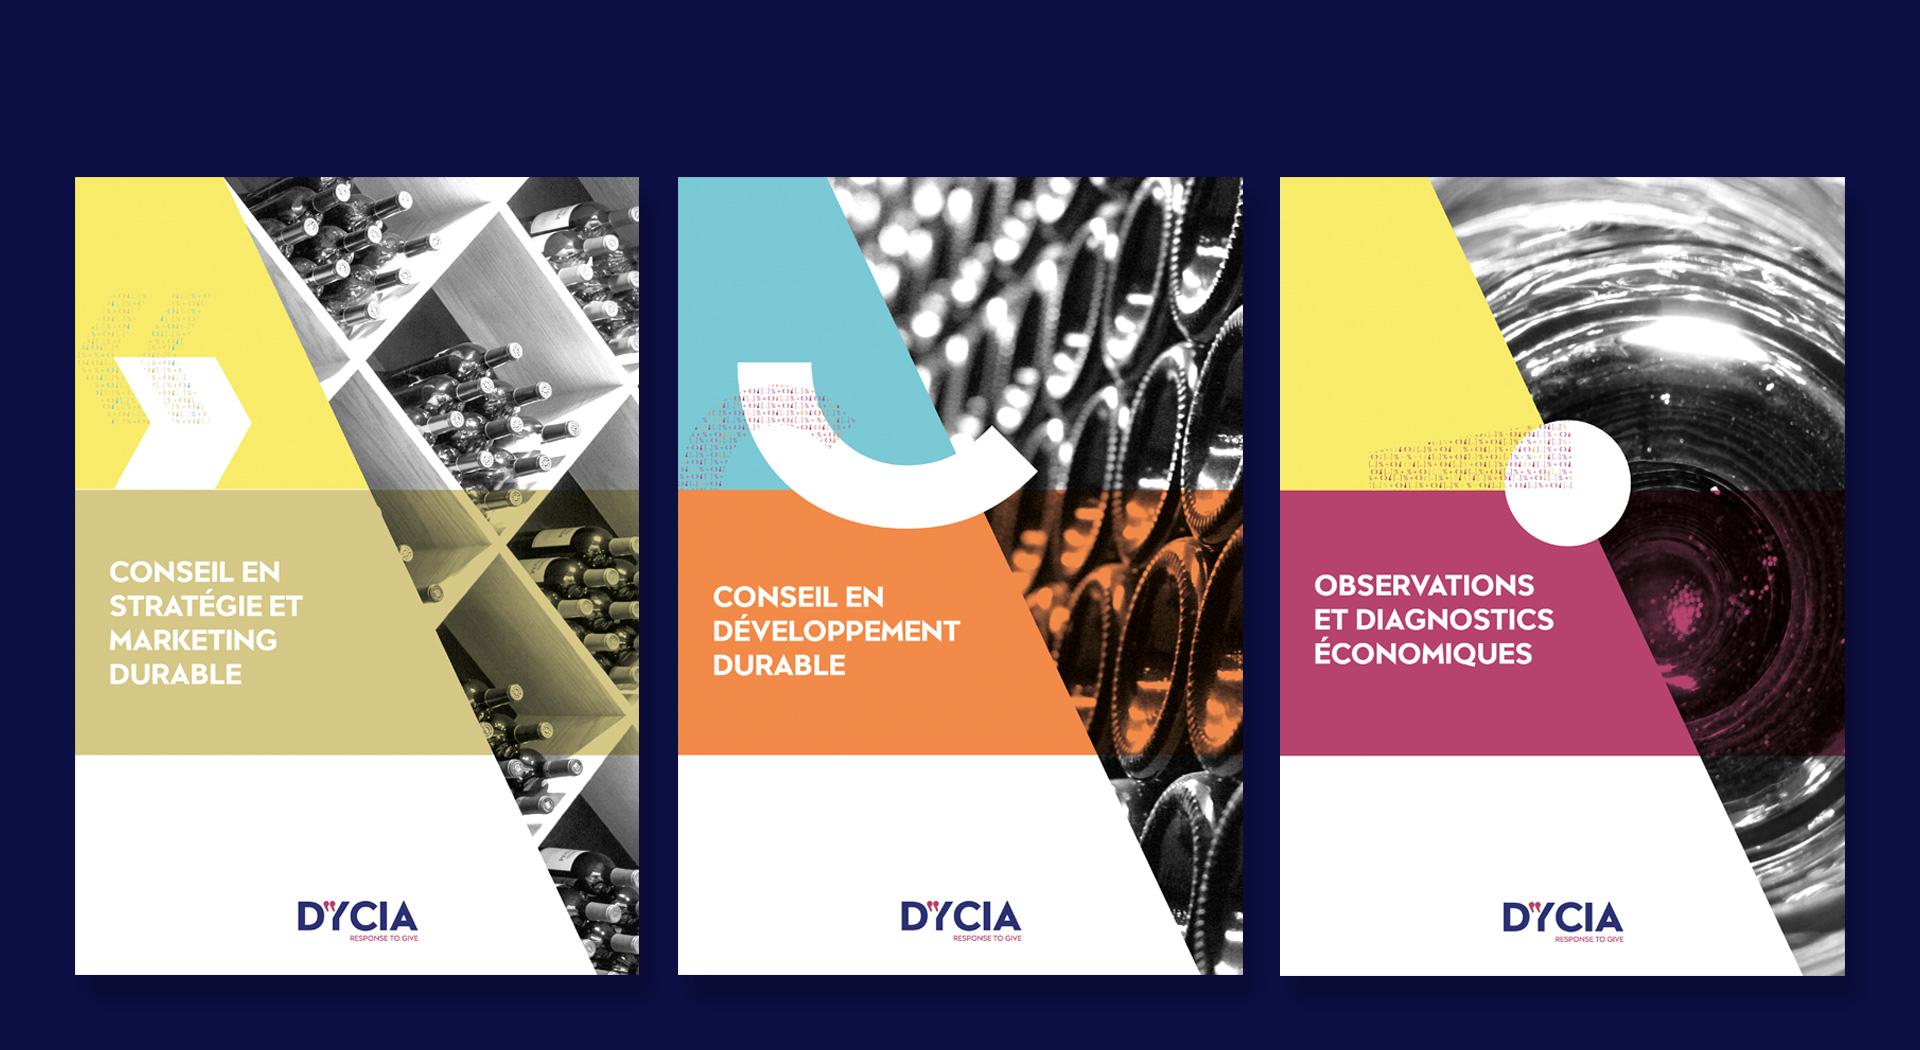 exemples couvertures documents - DYCIA